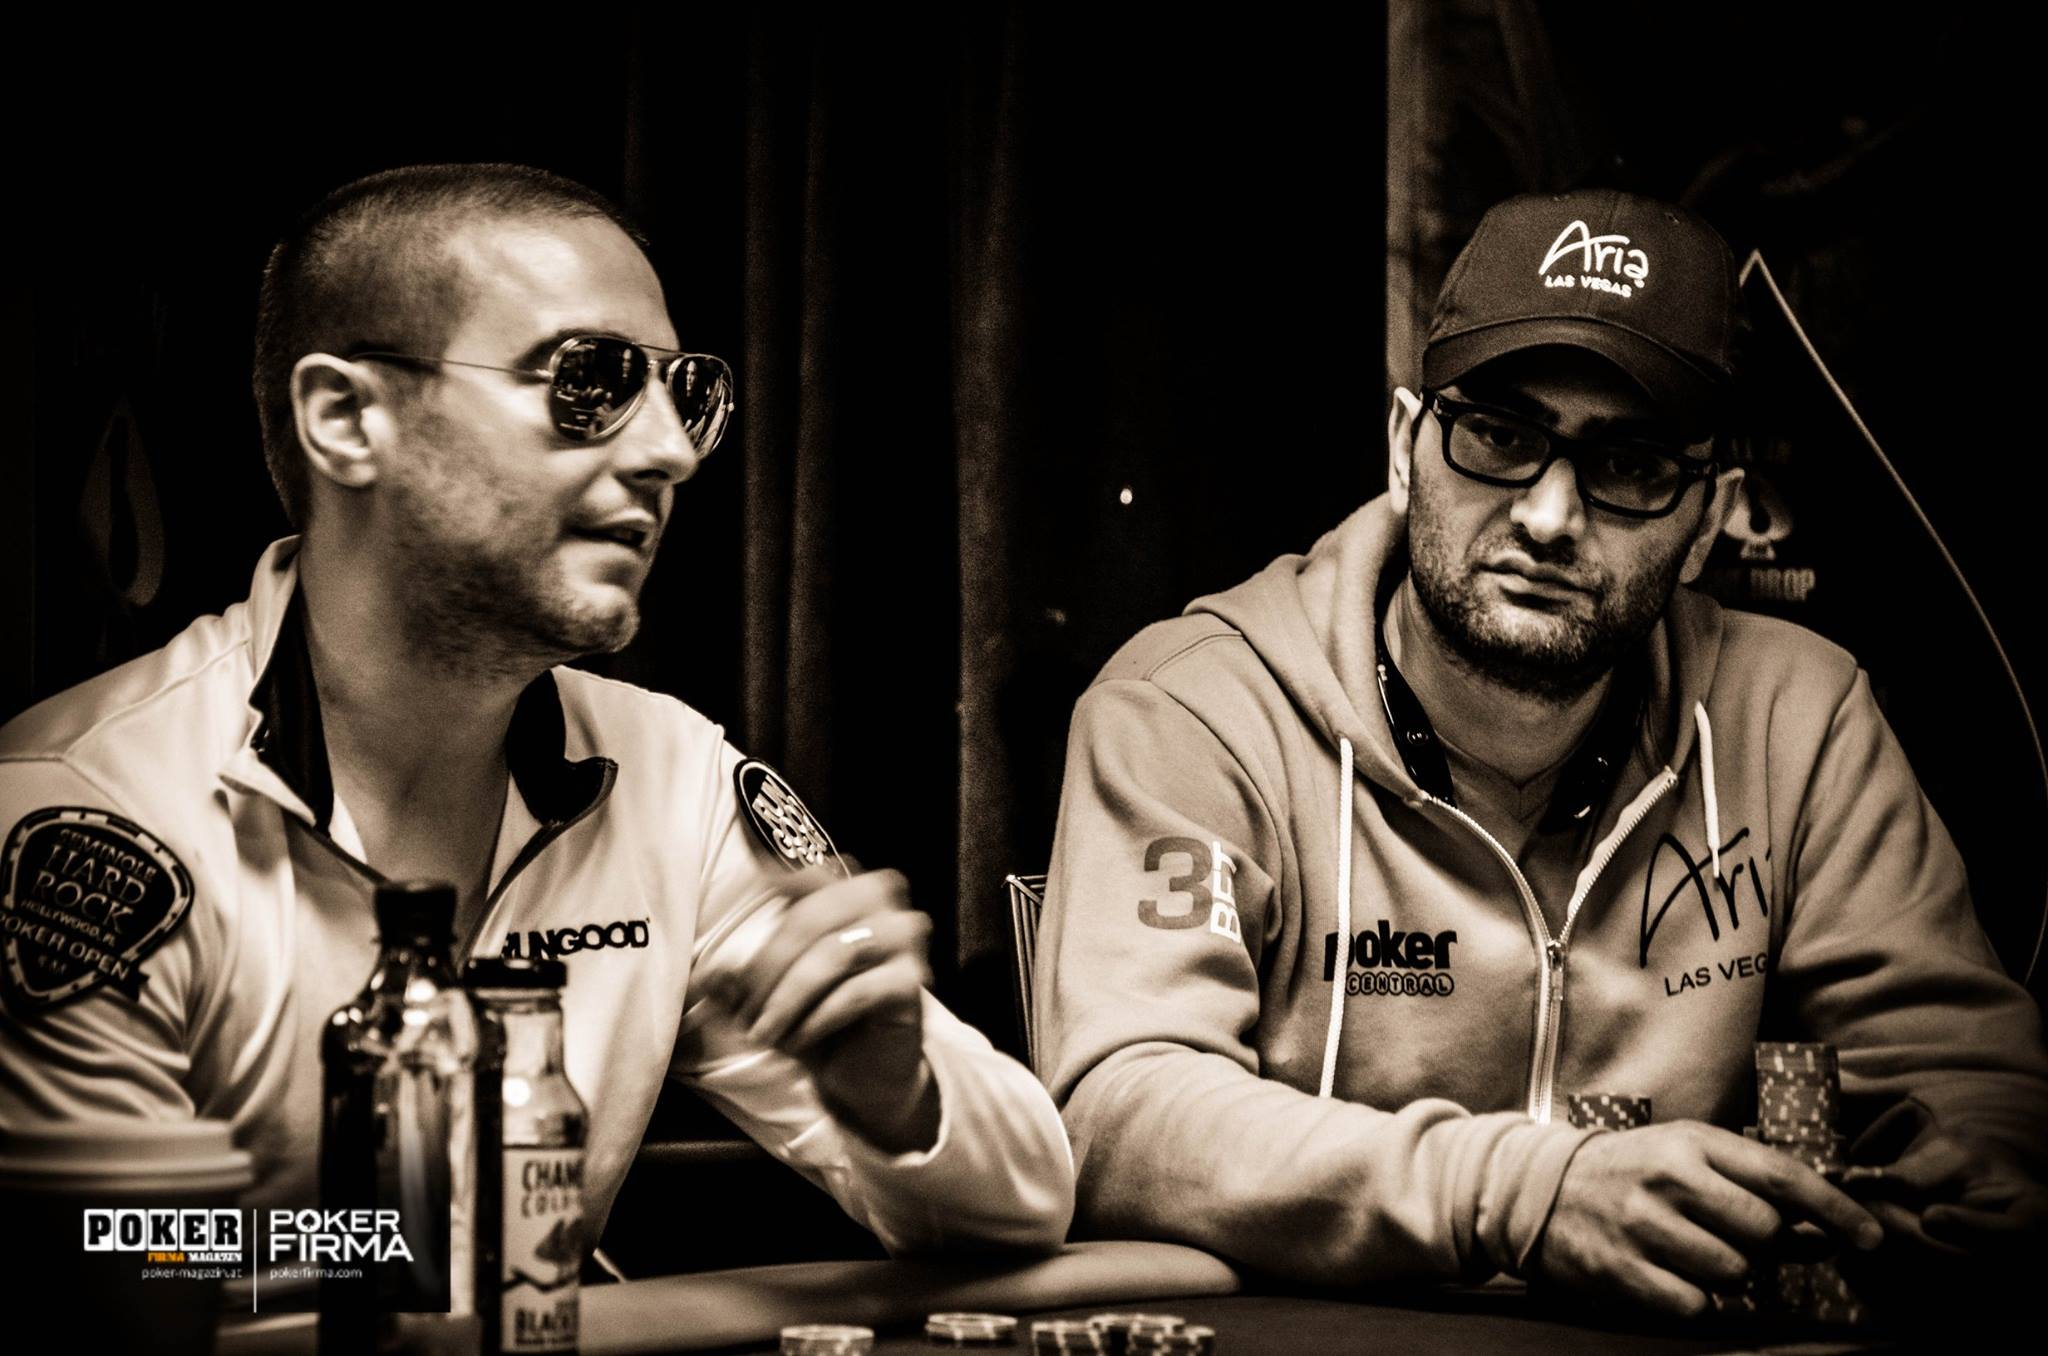 klatt poker spieler